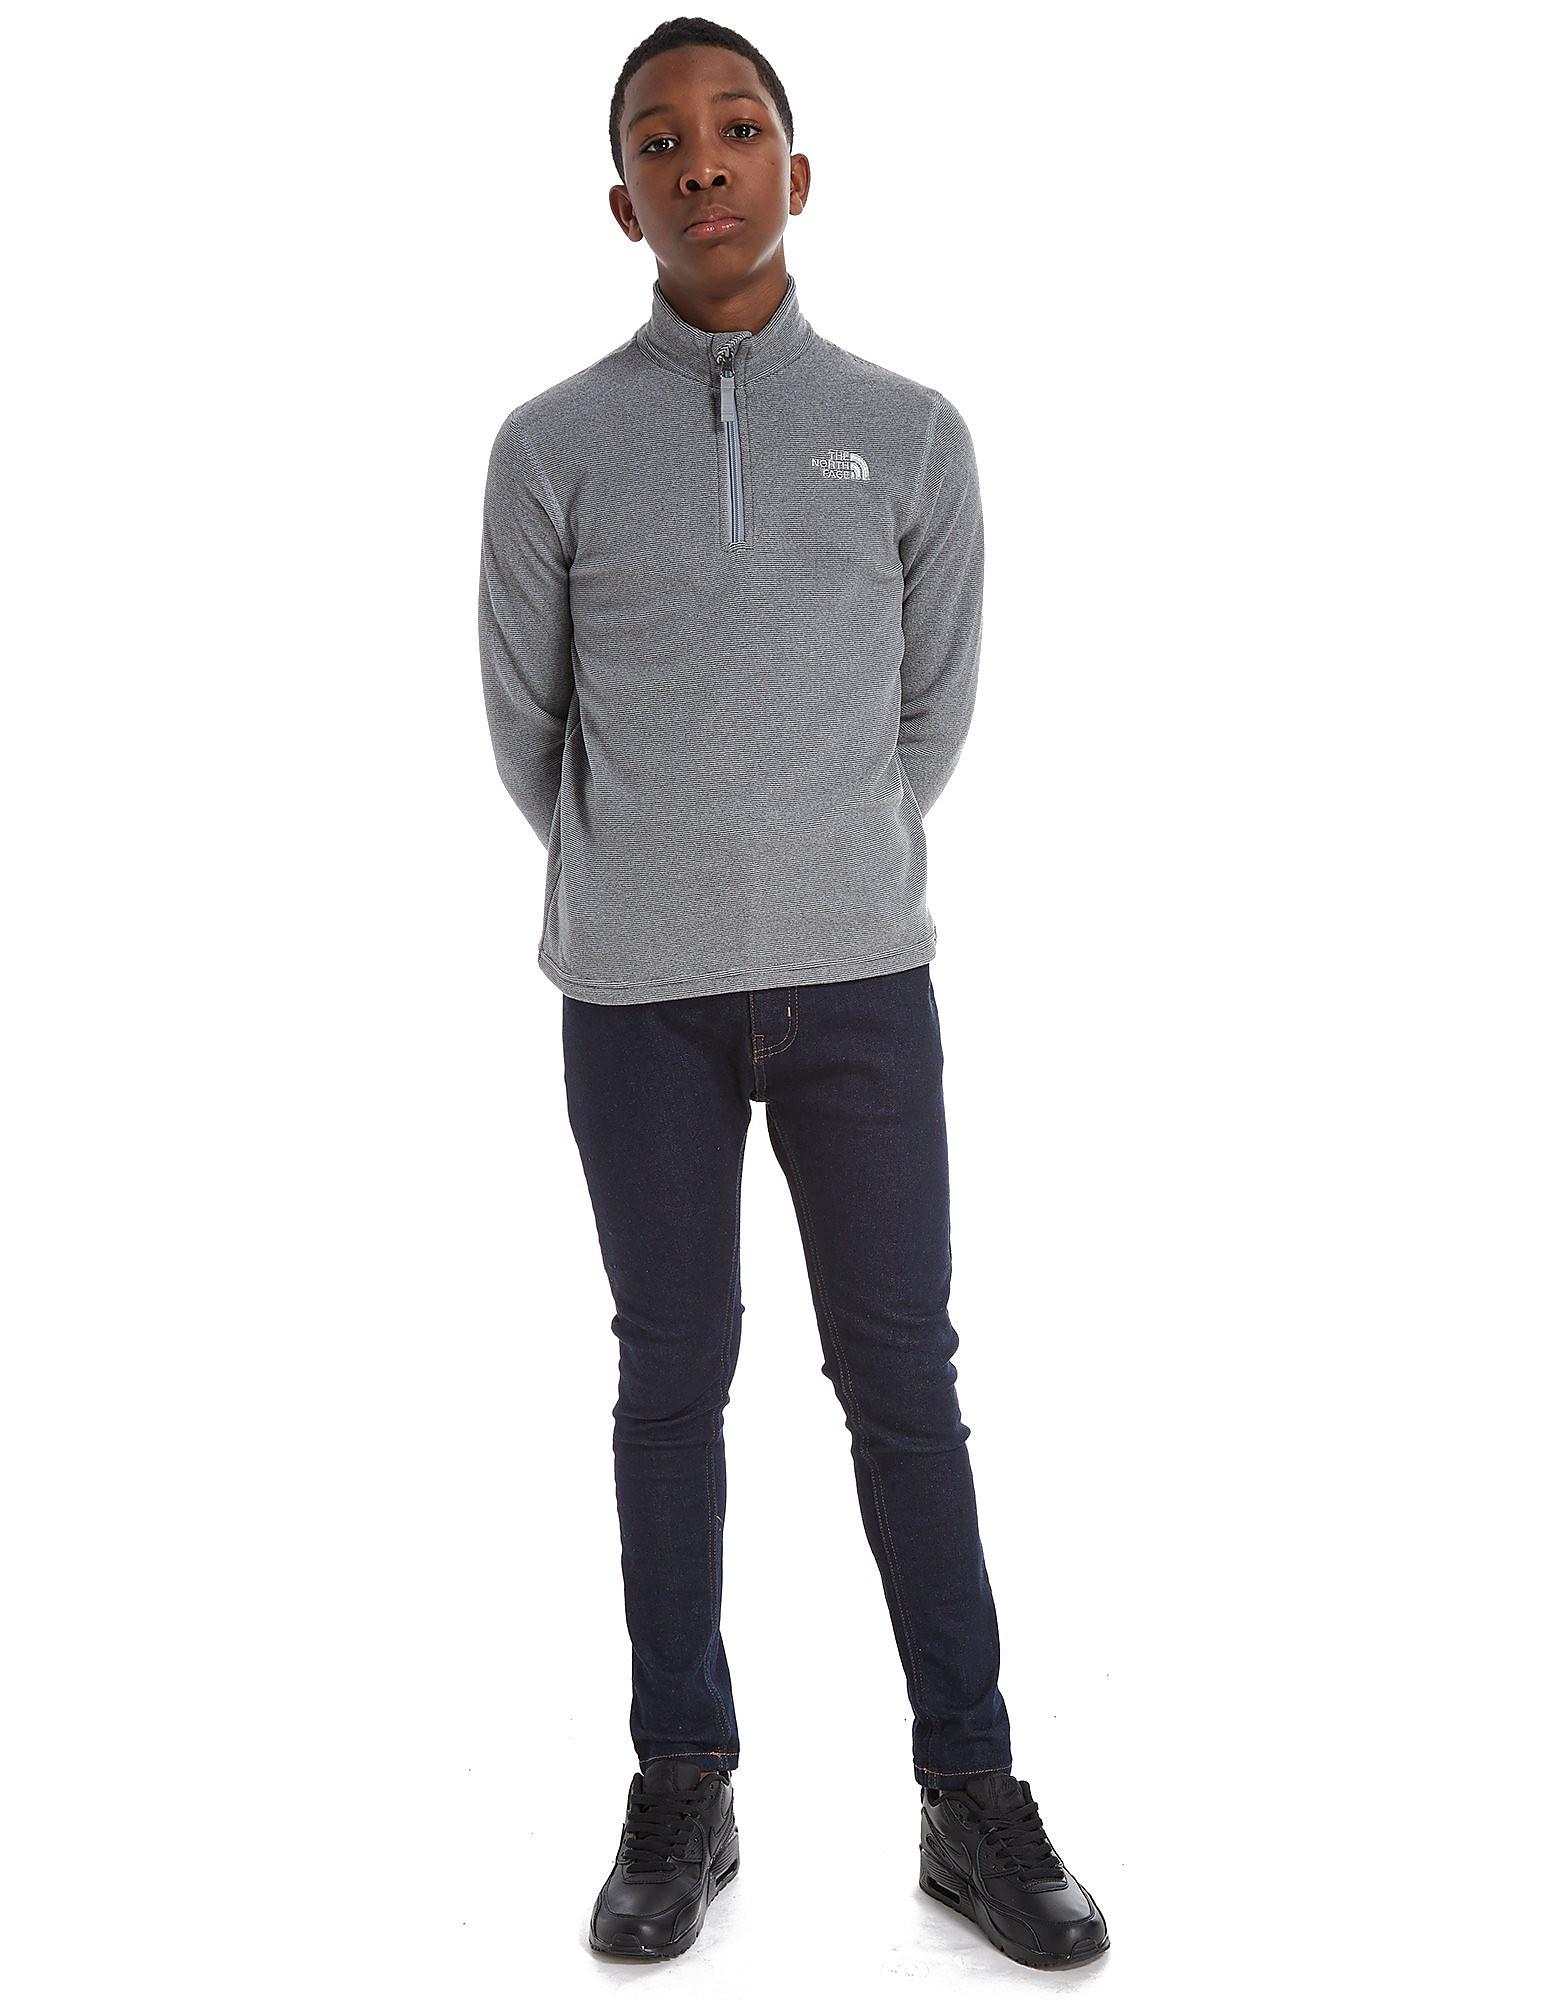 The North Face camiseta 100 Glacier 1/4 Zip júnior